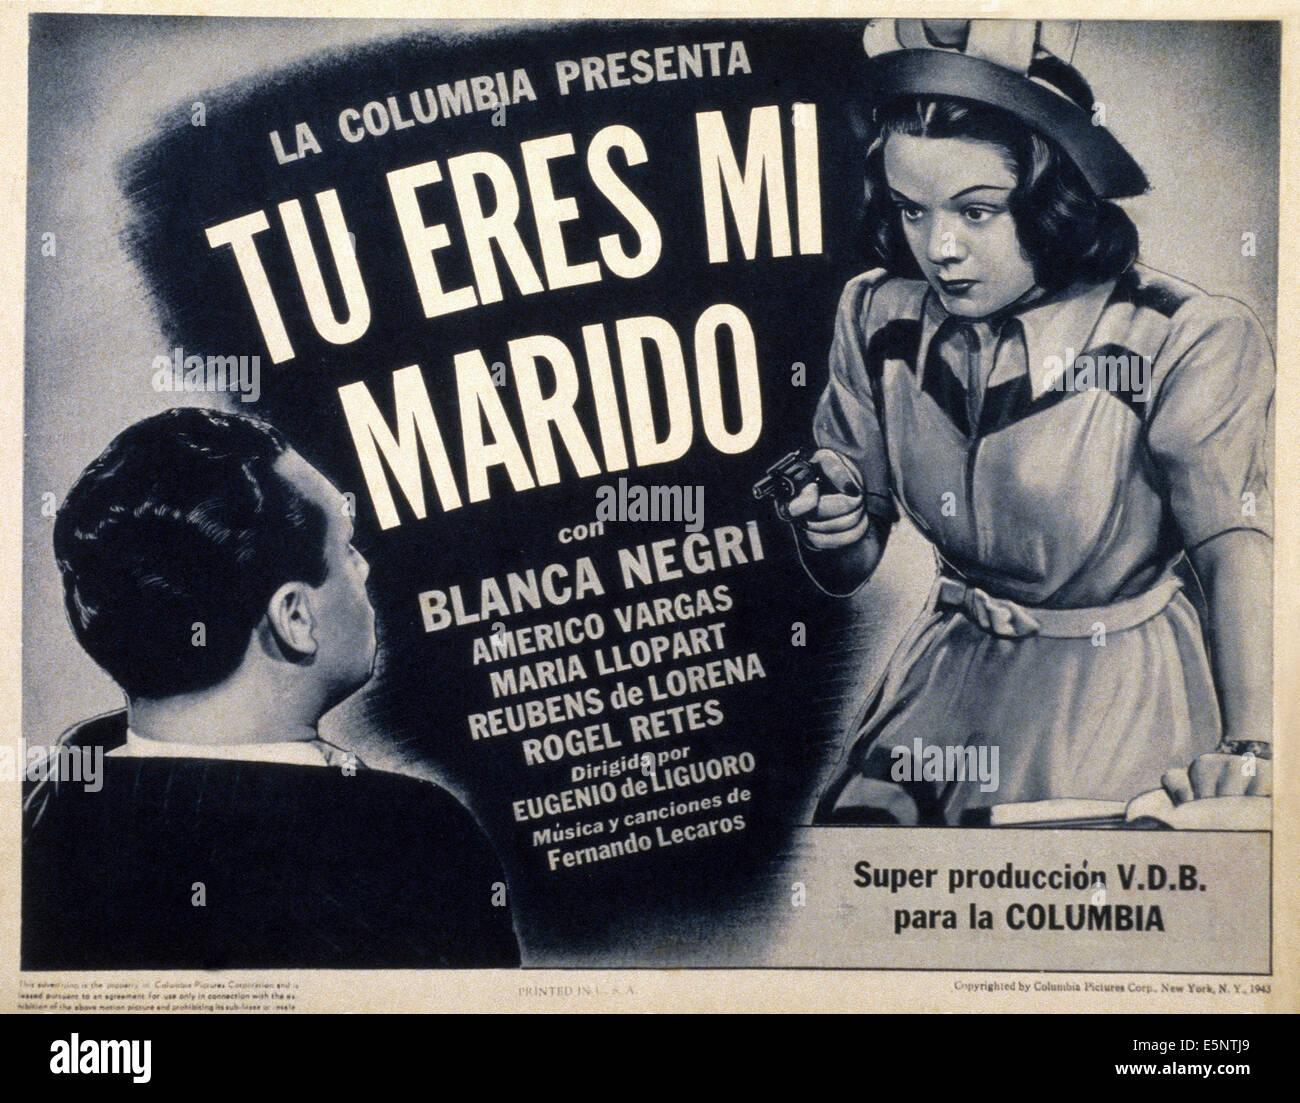 TU ERES MI MARIDO, nosotros póster, Blanca Negri, 1943 Imagen De Stock